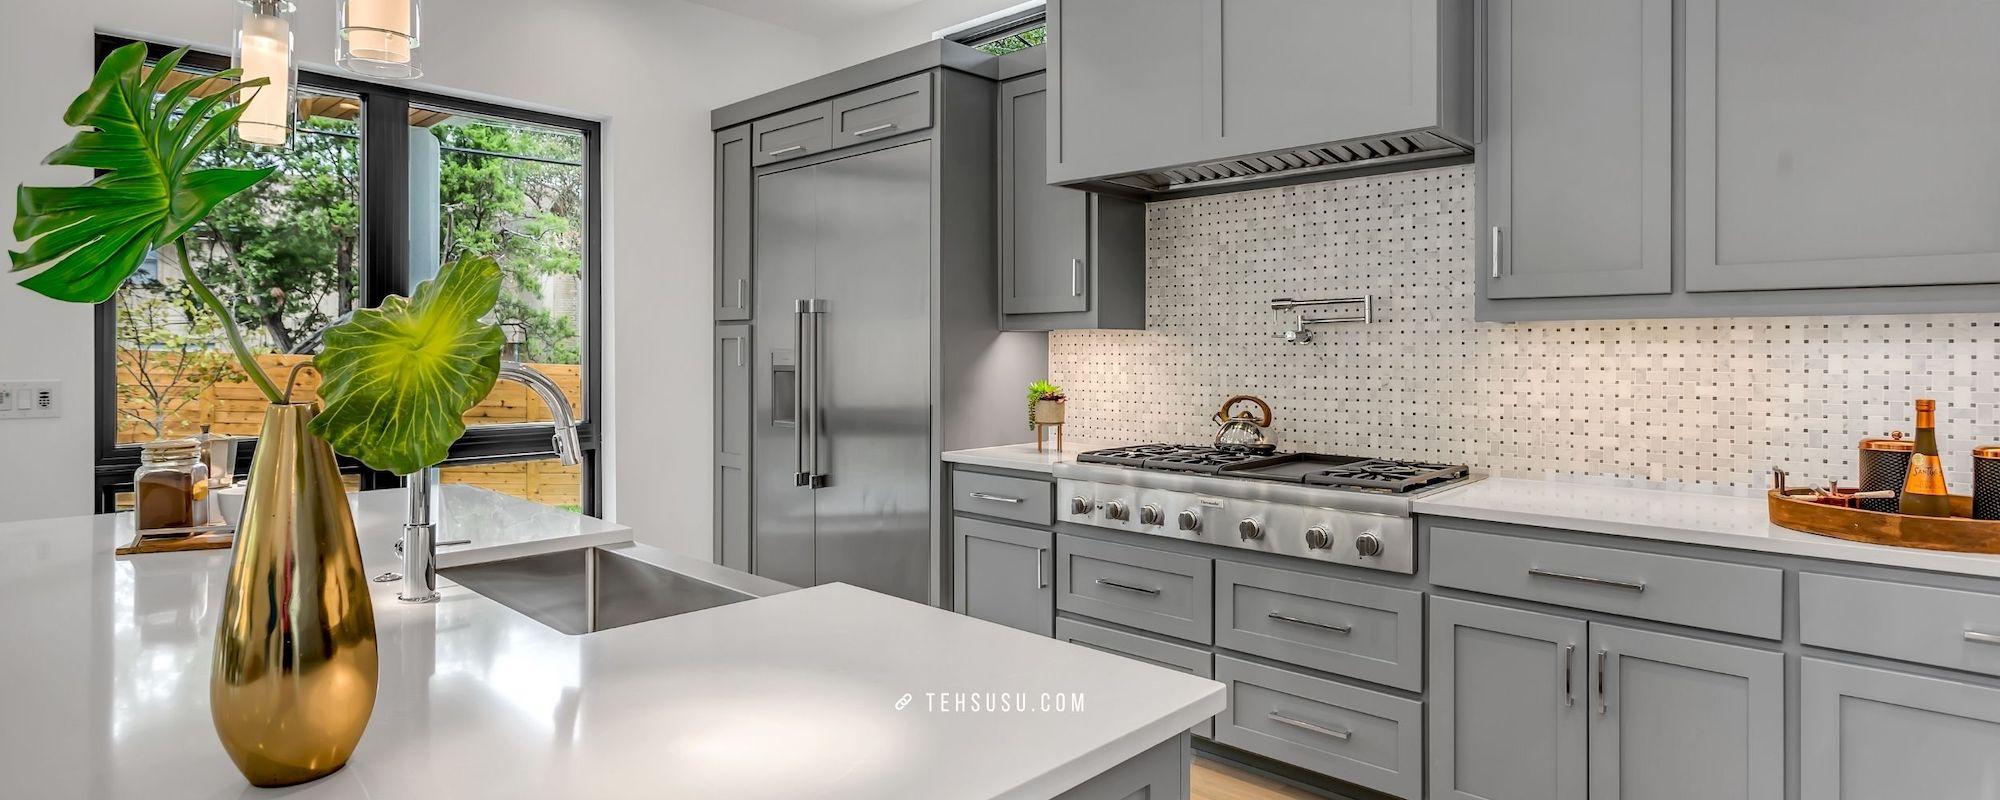 kitchen set untuk mempercantik dapur